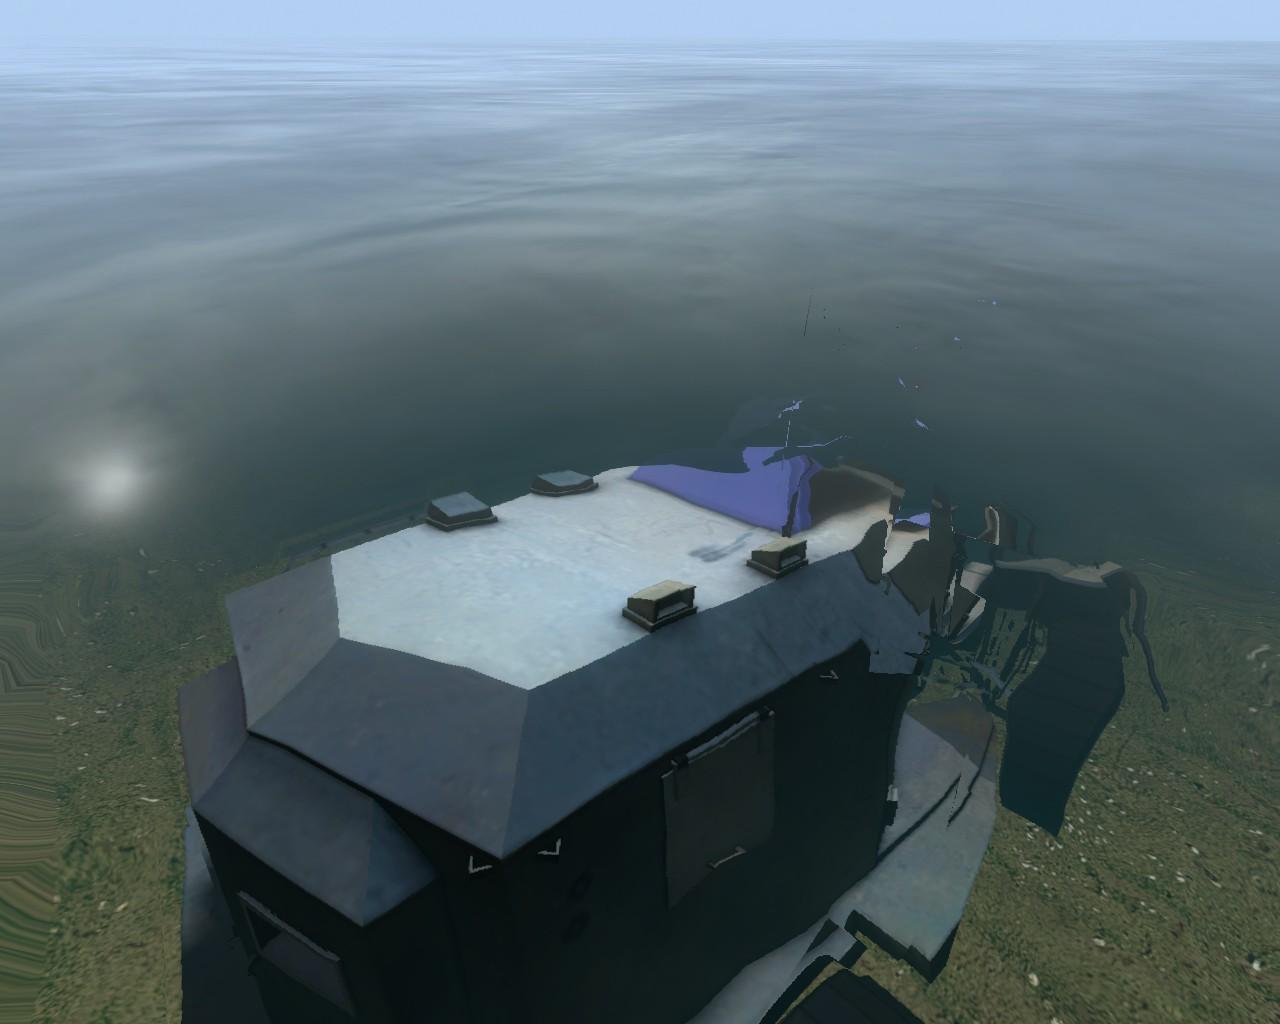 d2_coast_090008.jpg - Half-Life 2